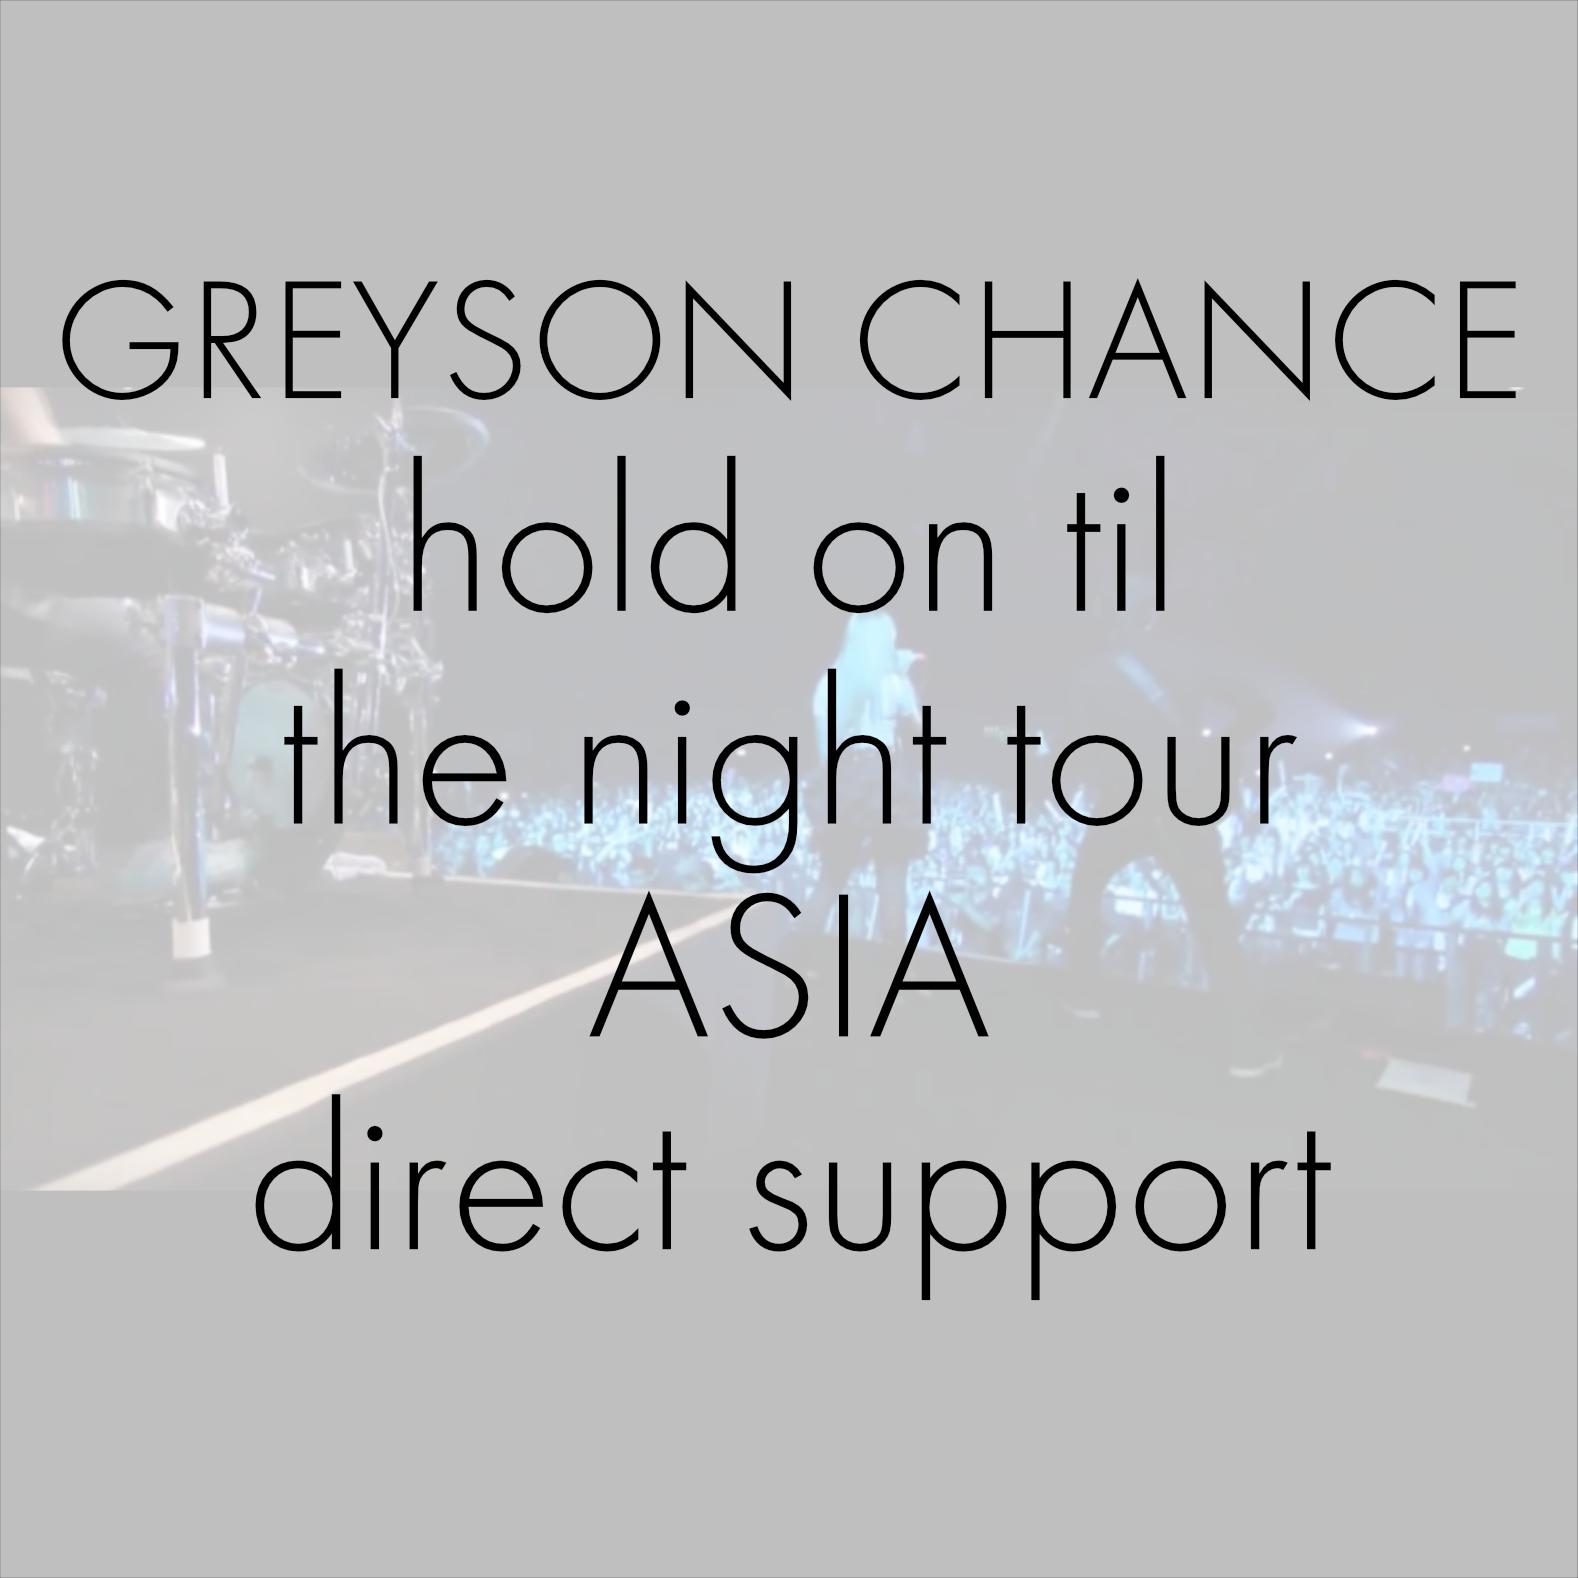 greyson chance.jpg